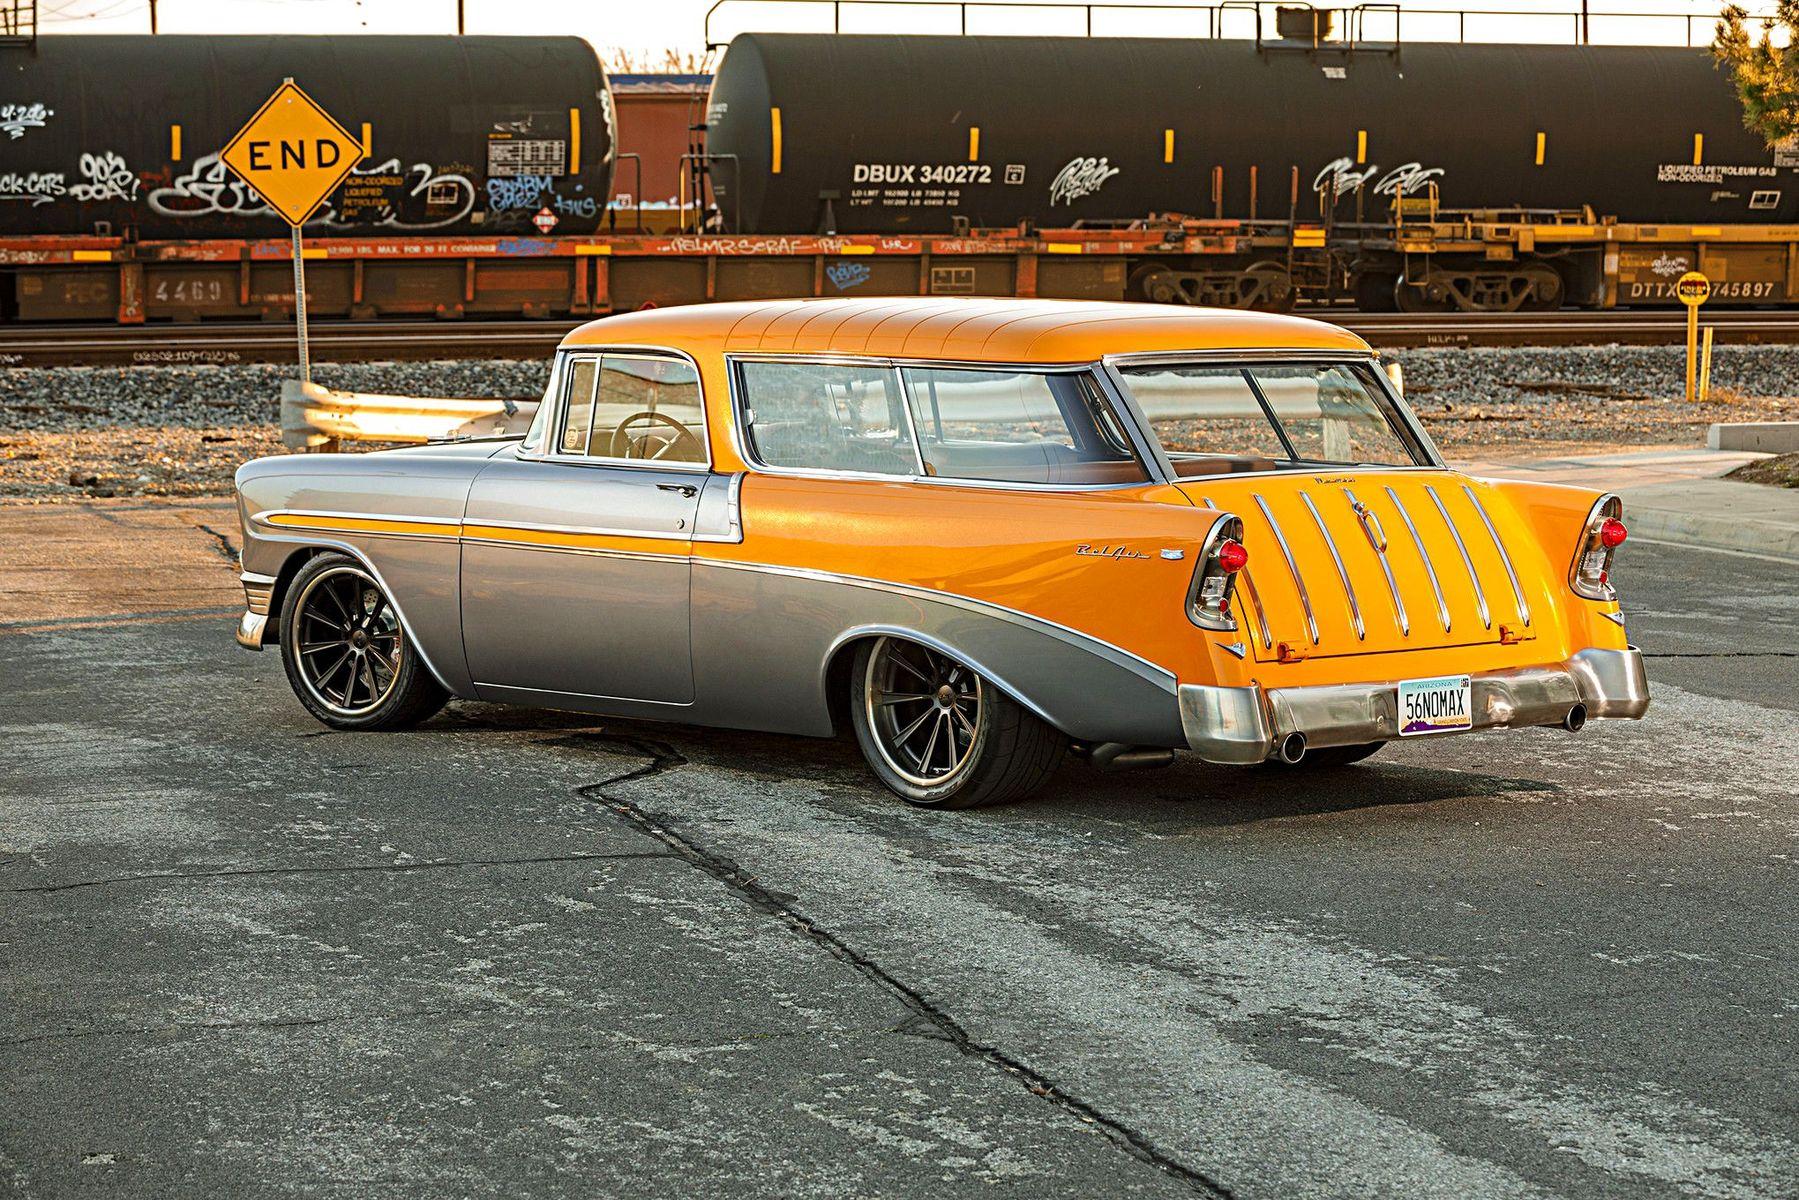 1956 Chevrolet Bel Air | John Dwyer's